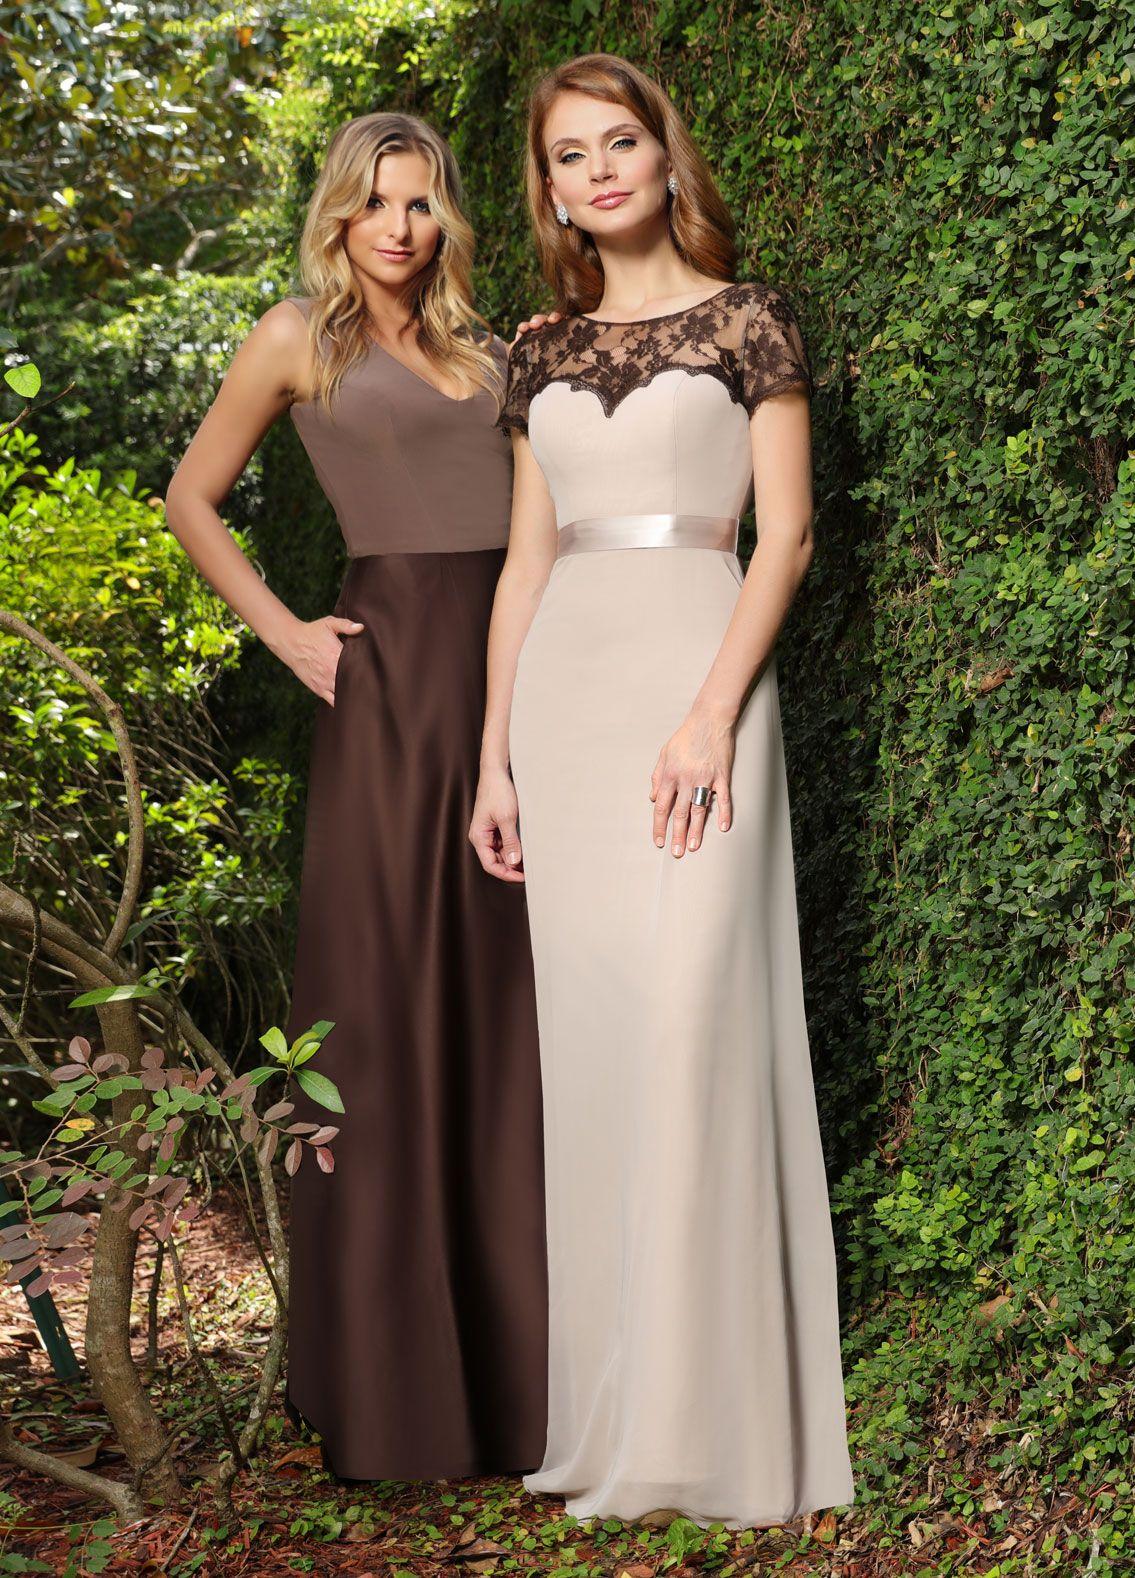 Impression bridesmaids left right bridesmaid gowns